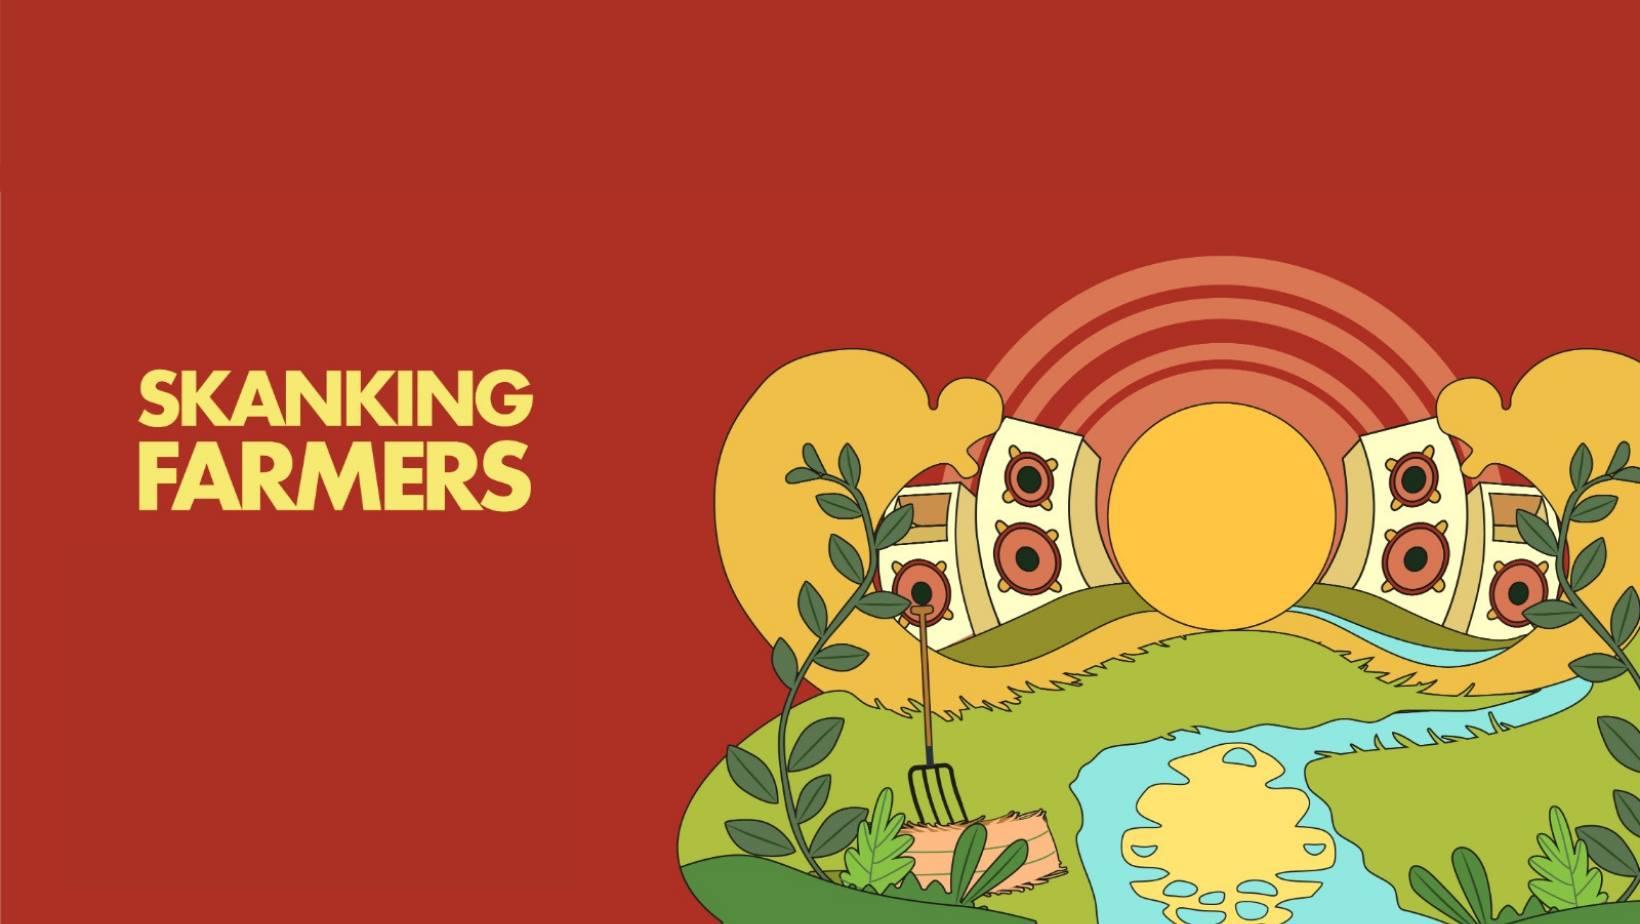 Skanking farmers